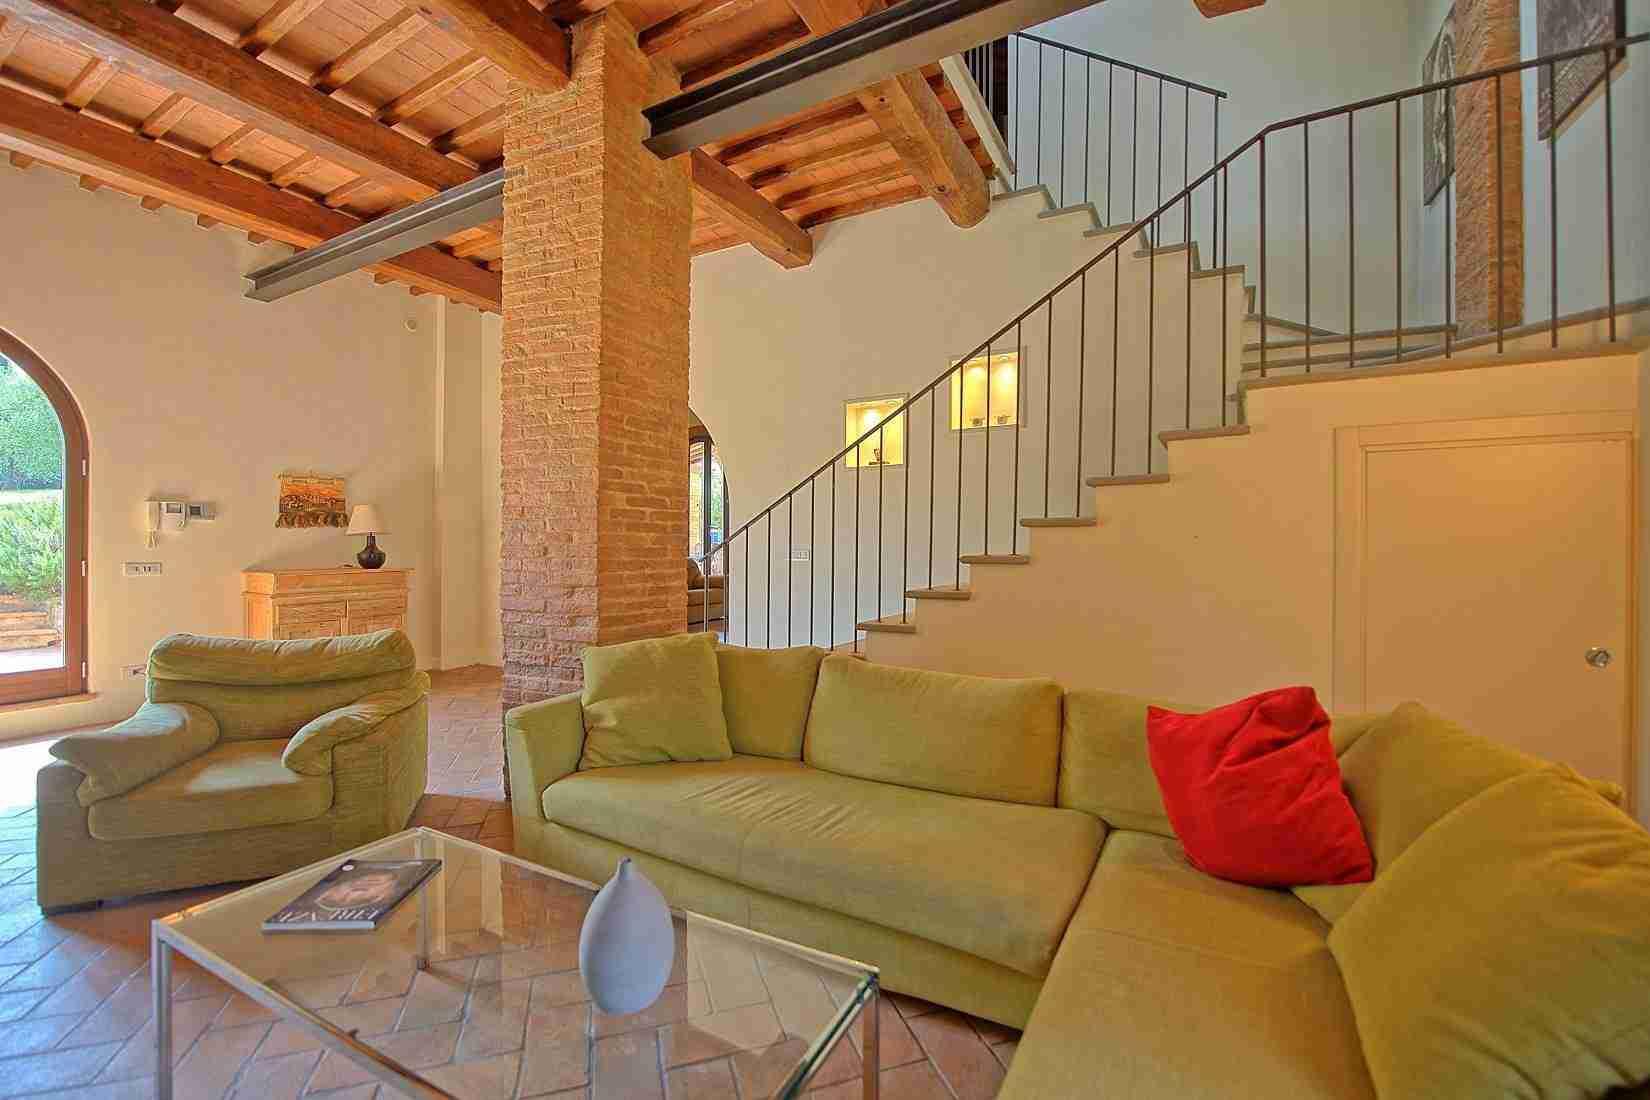 7 Ranieri living room